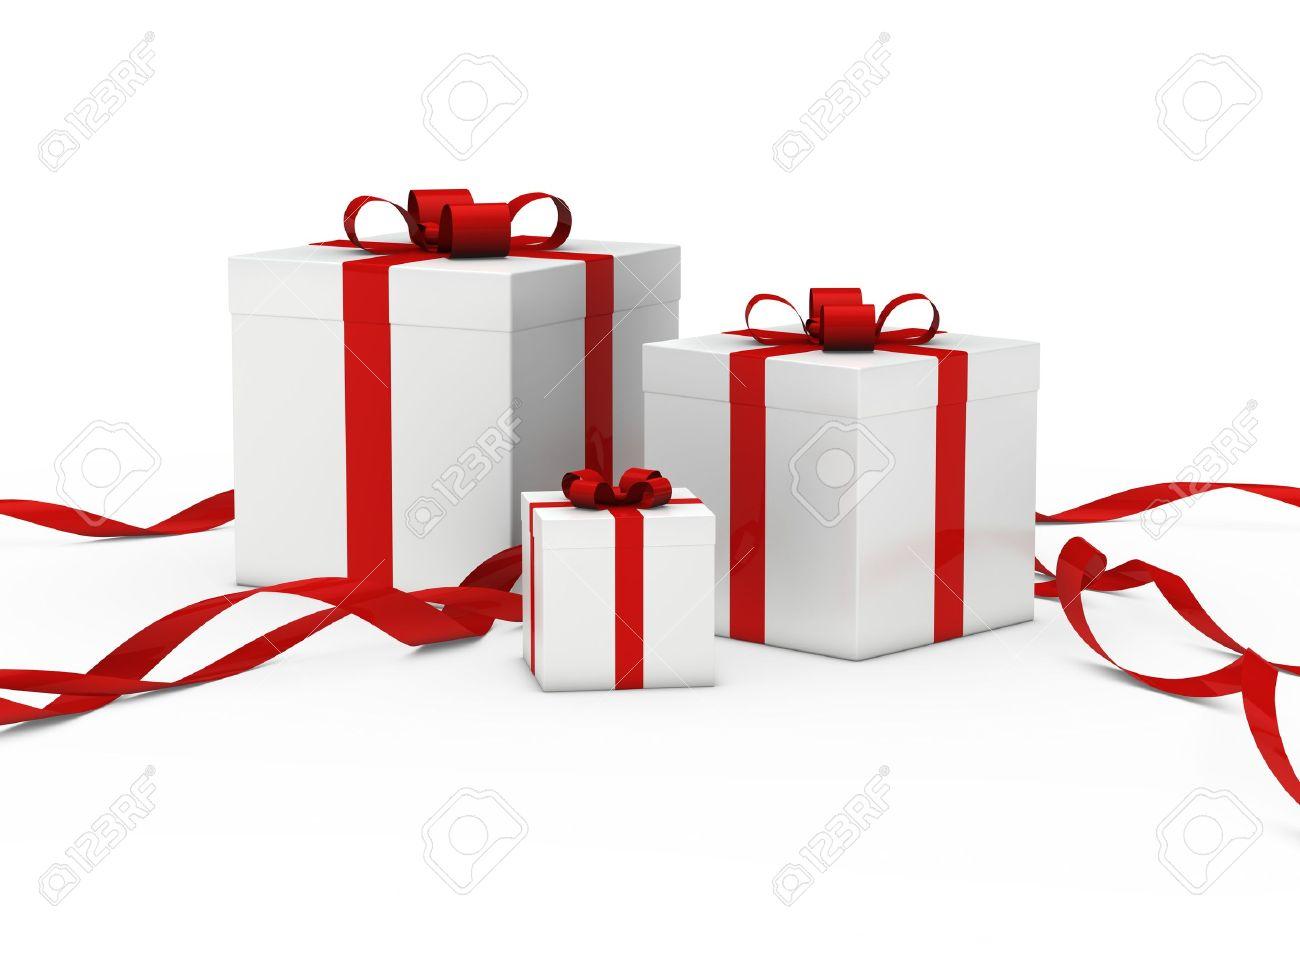 Christmas gift box white white red ribbon christmas gift box white white red ribbon 11209734 negle Choice Image